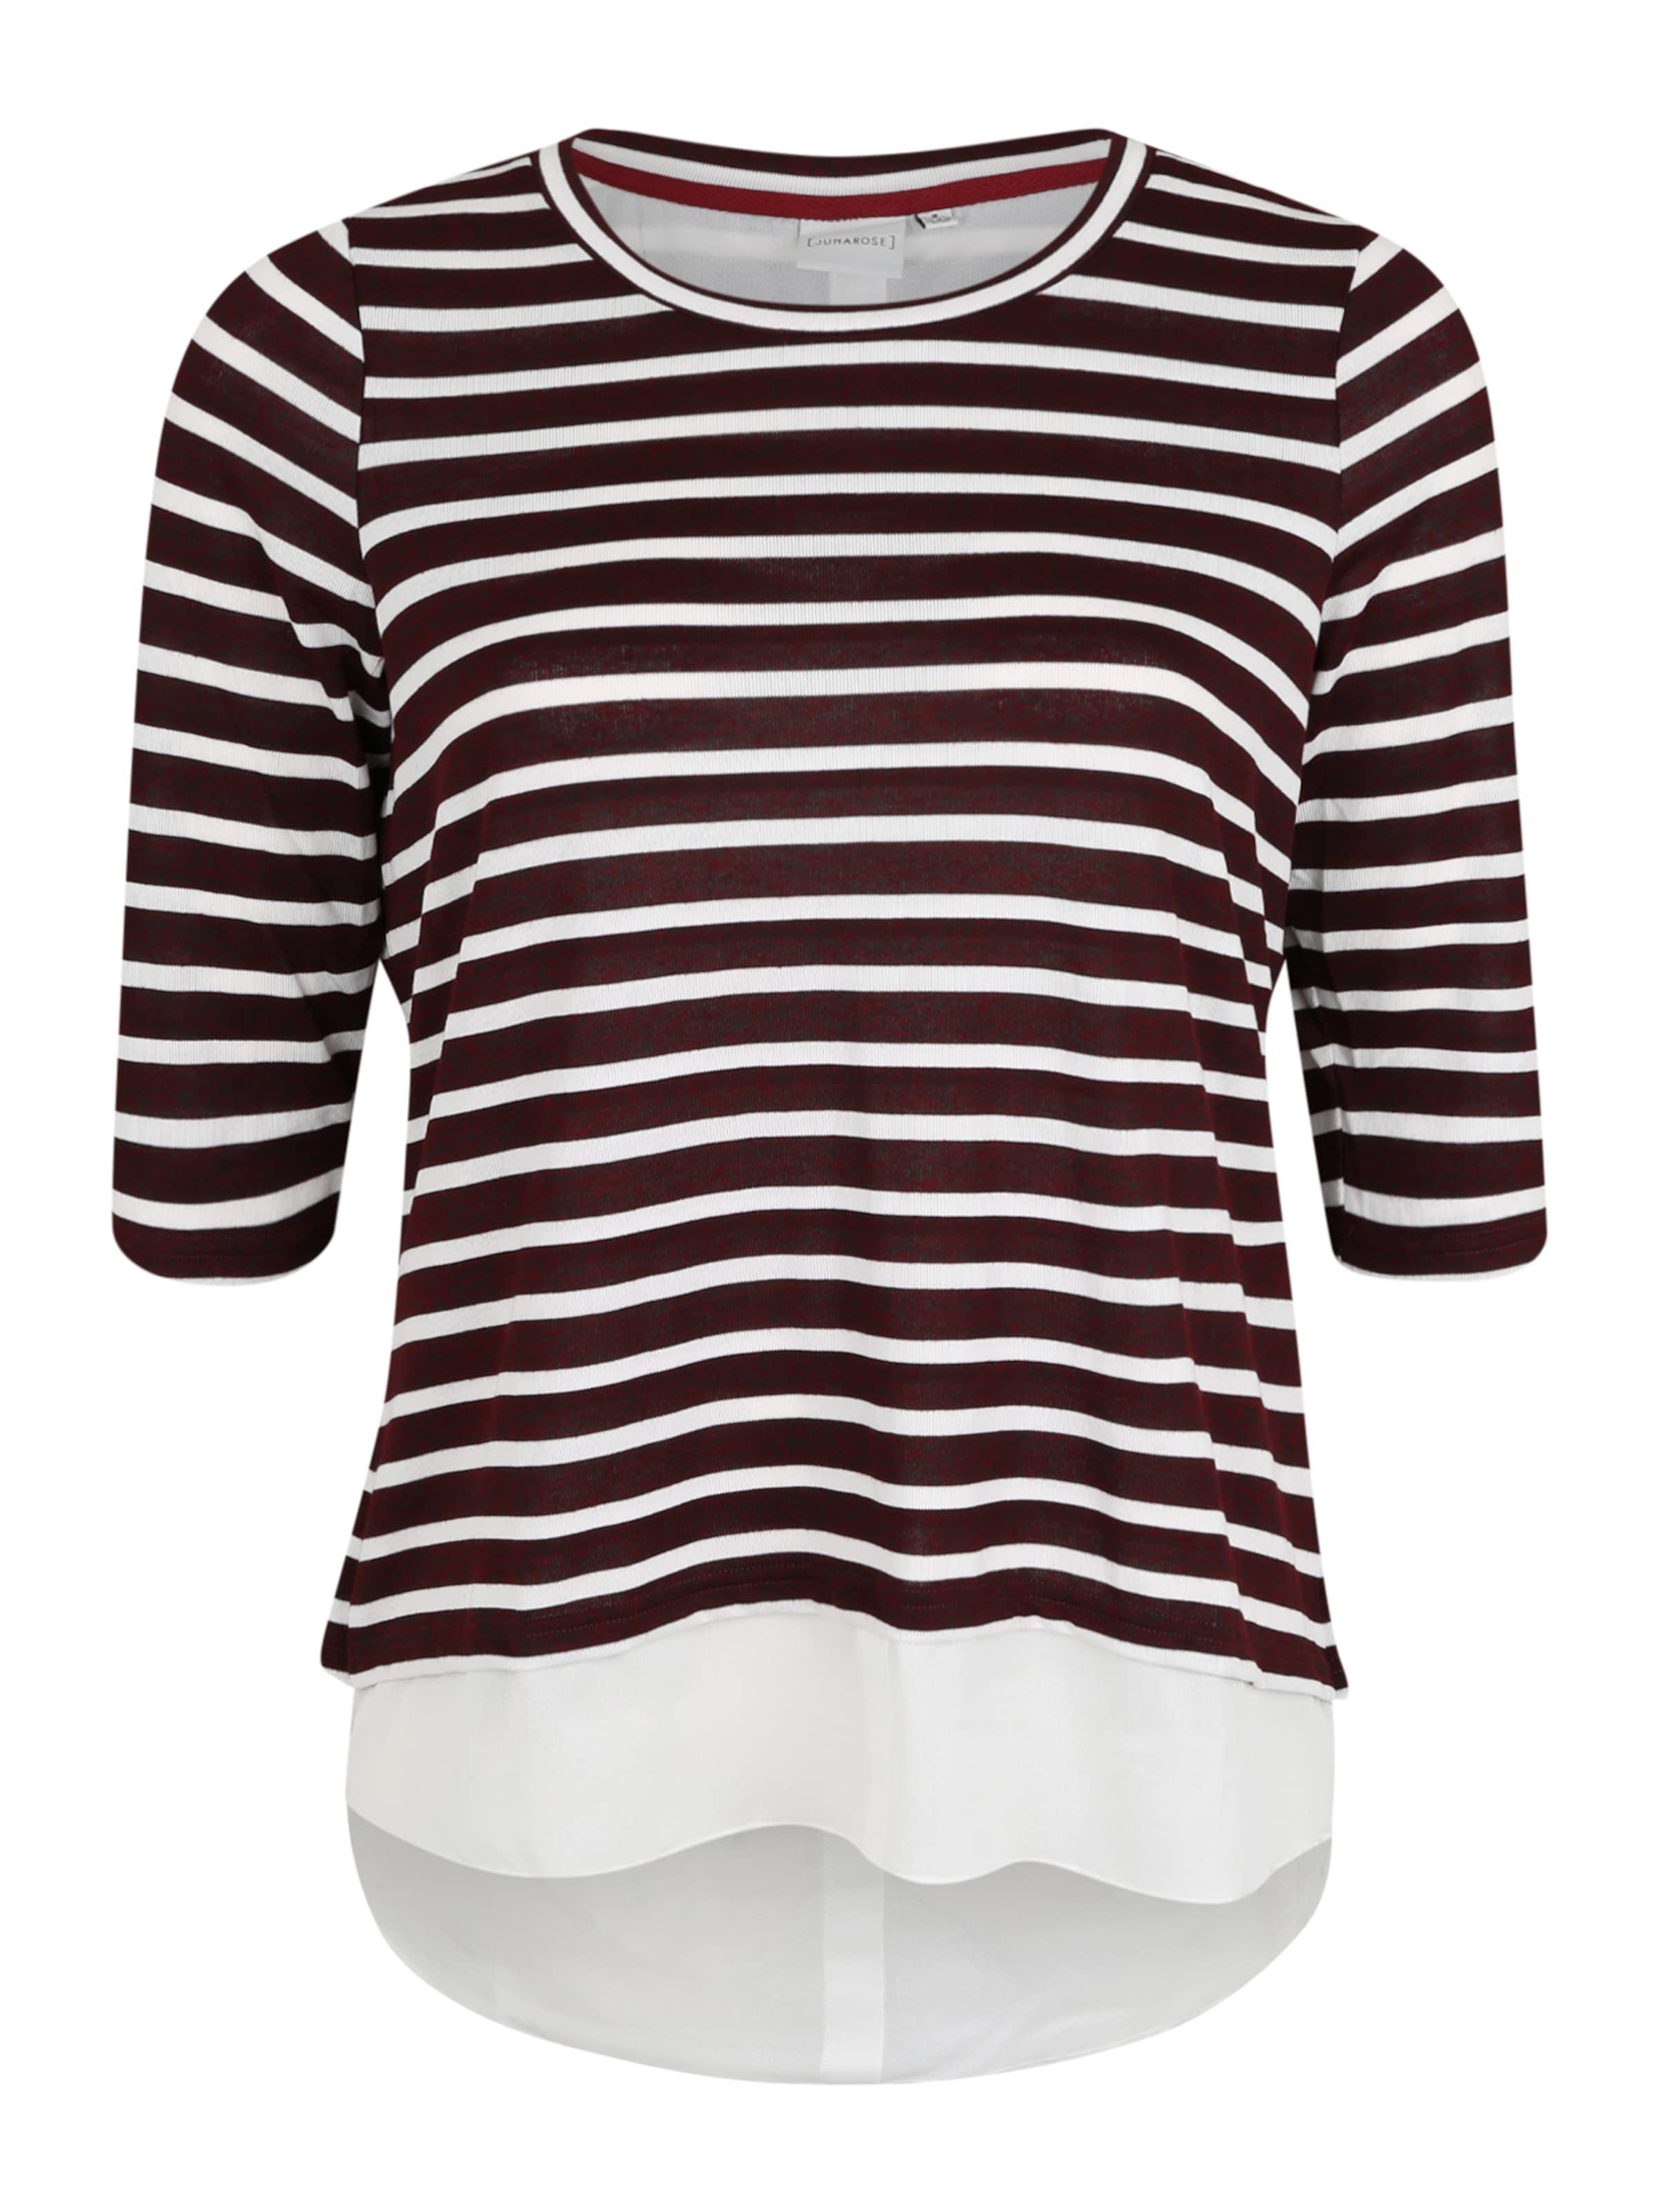 Junarose Sl PulloverS' shirt 3 Knit 'jrjessie 4 En NoirBlanc T K3Tl1JFc